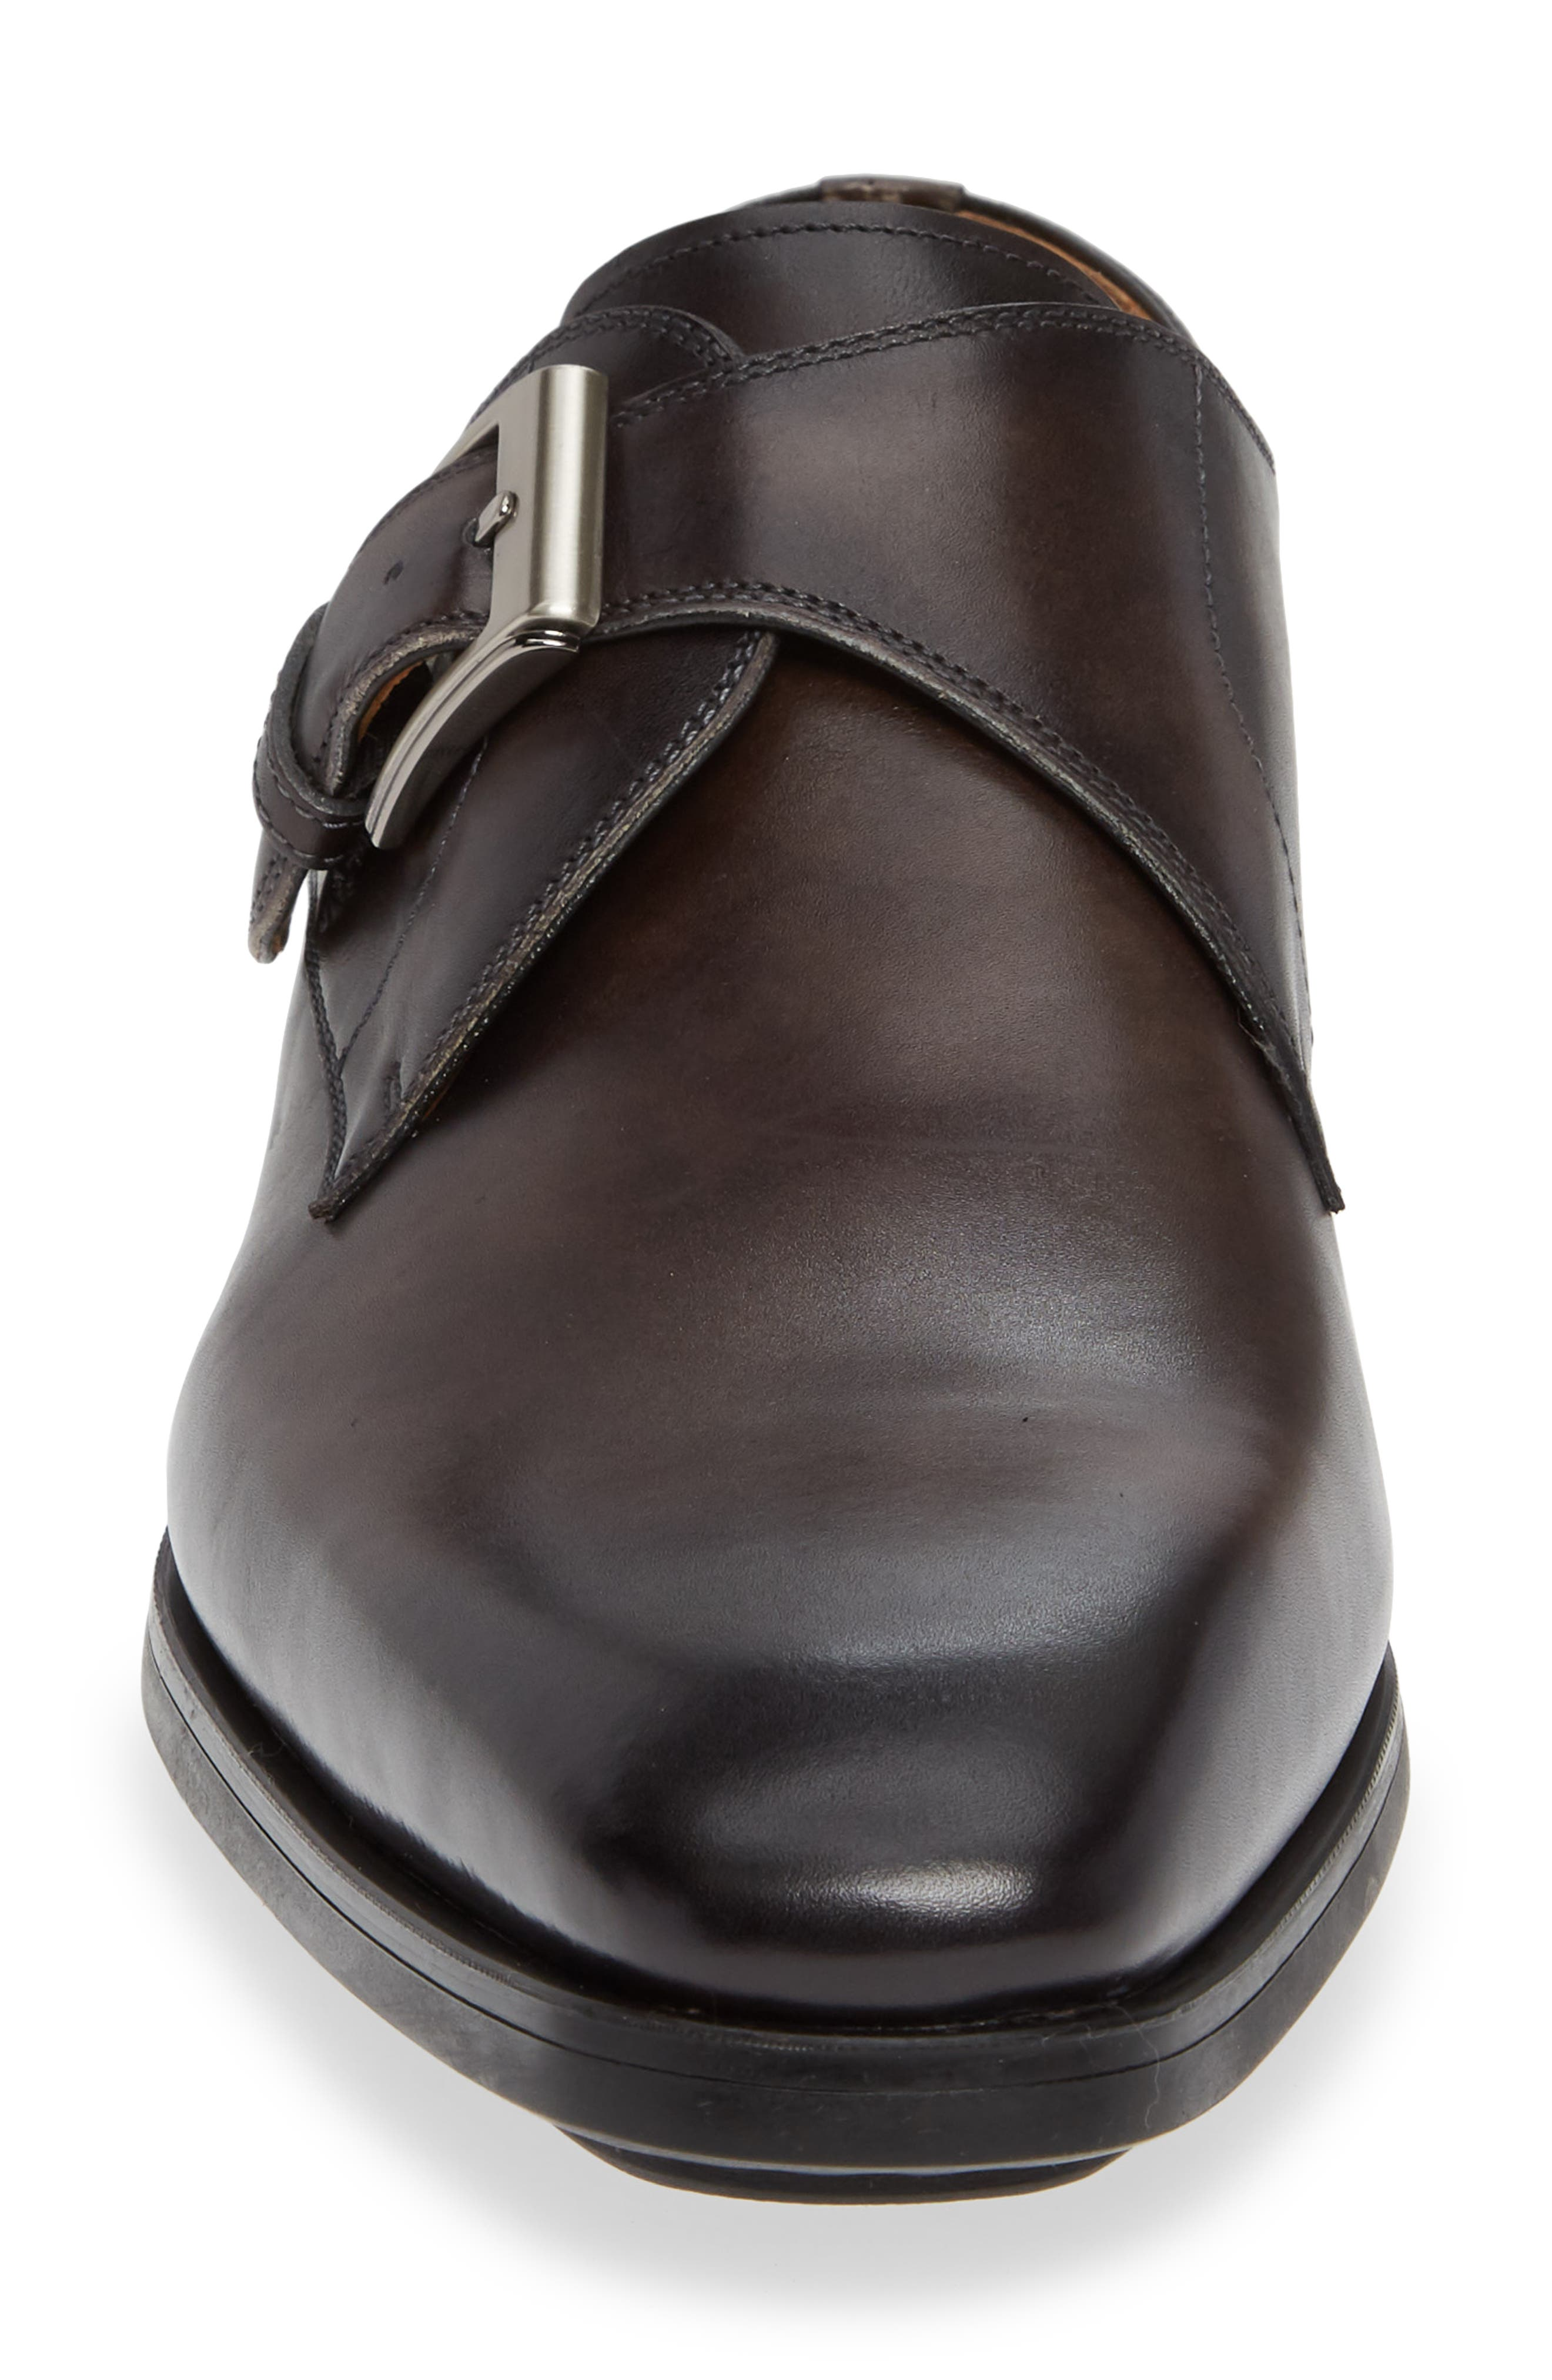 MAGNANNI, Roddy Diversa Plain Toe Monk Strap Shoe, Alternate thumbnail 4, color, GREY LEATHER